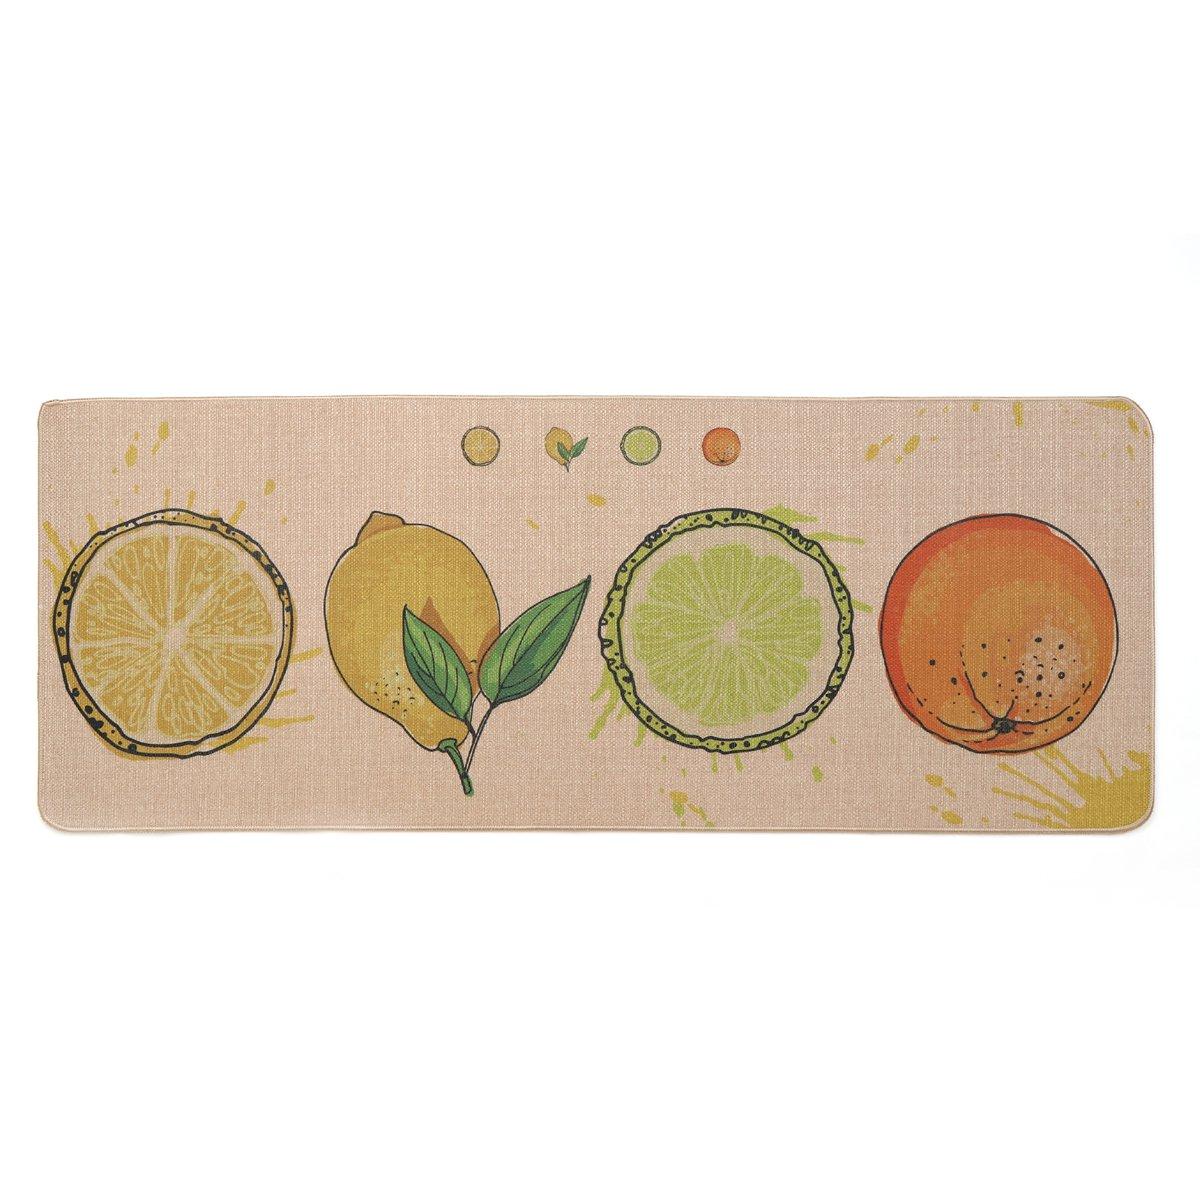 Kitchen Rugs,LEEVAN Microfiber Non-Skid/Slip Rubber Back Washable Doormat Floormat Area Rug Carpet(Fruits,17'' X 47'')